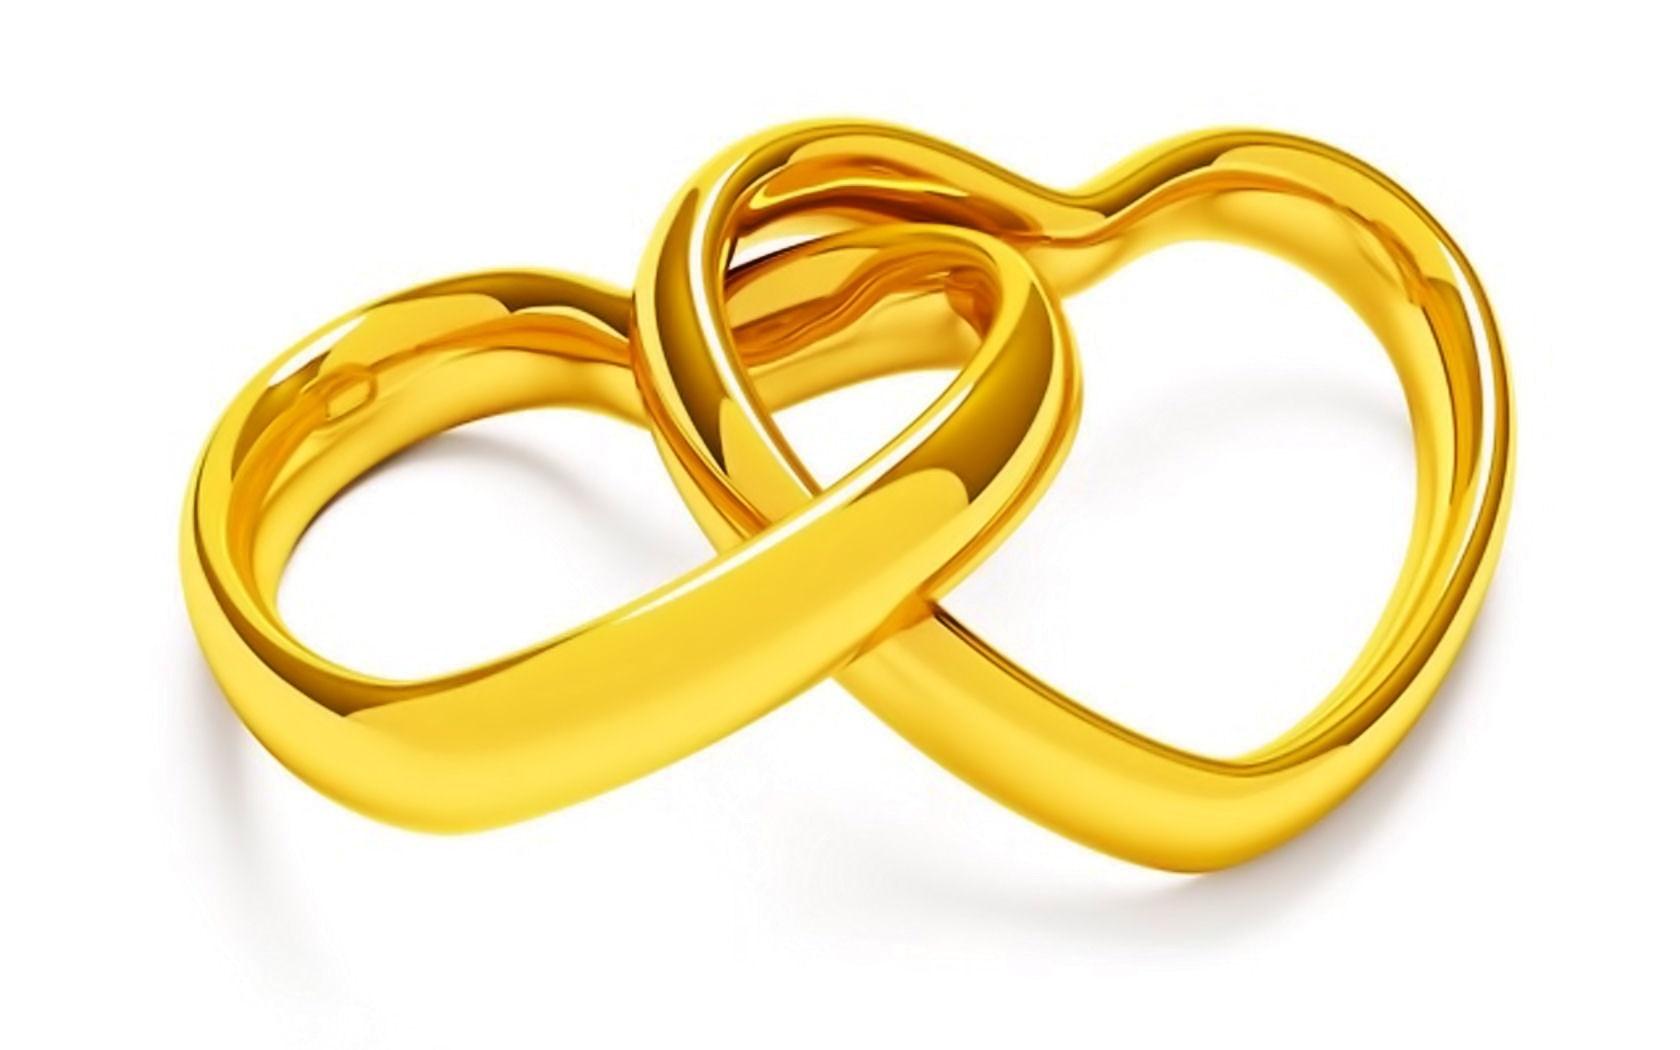 Matrimonio Catolico Caricatura : Dwa złote serca